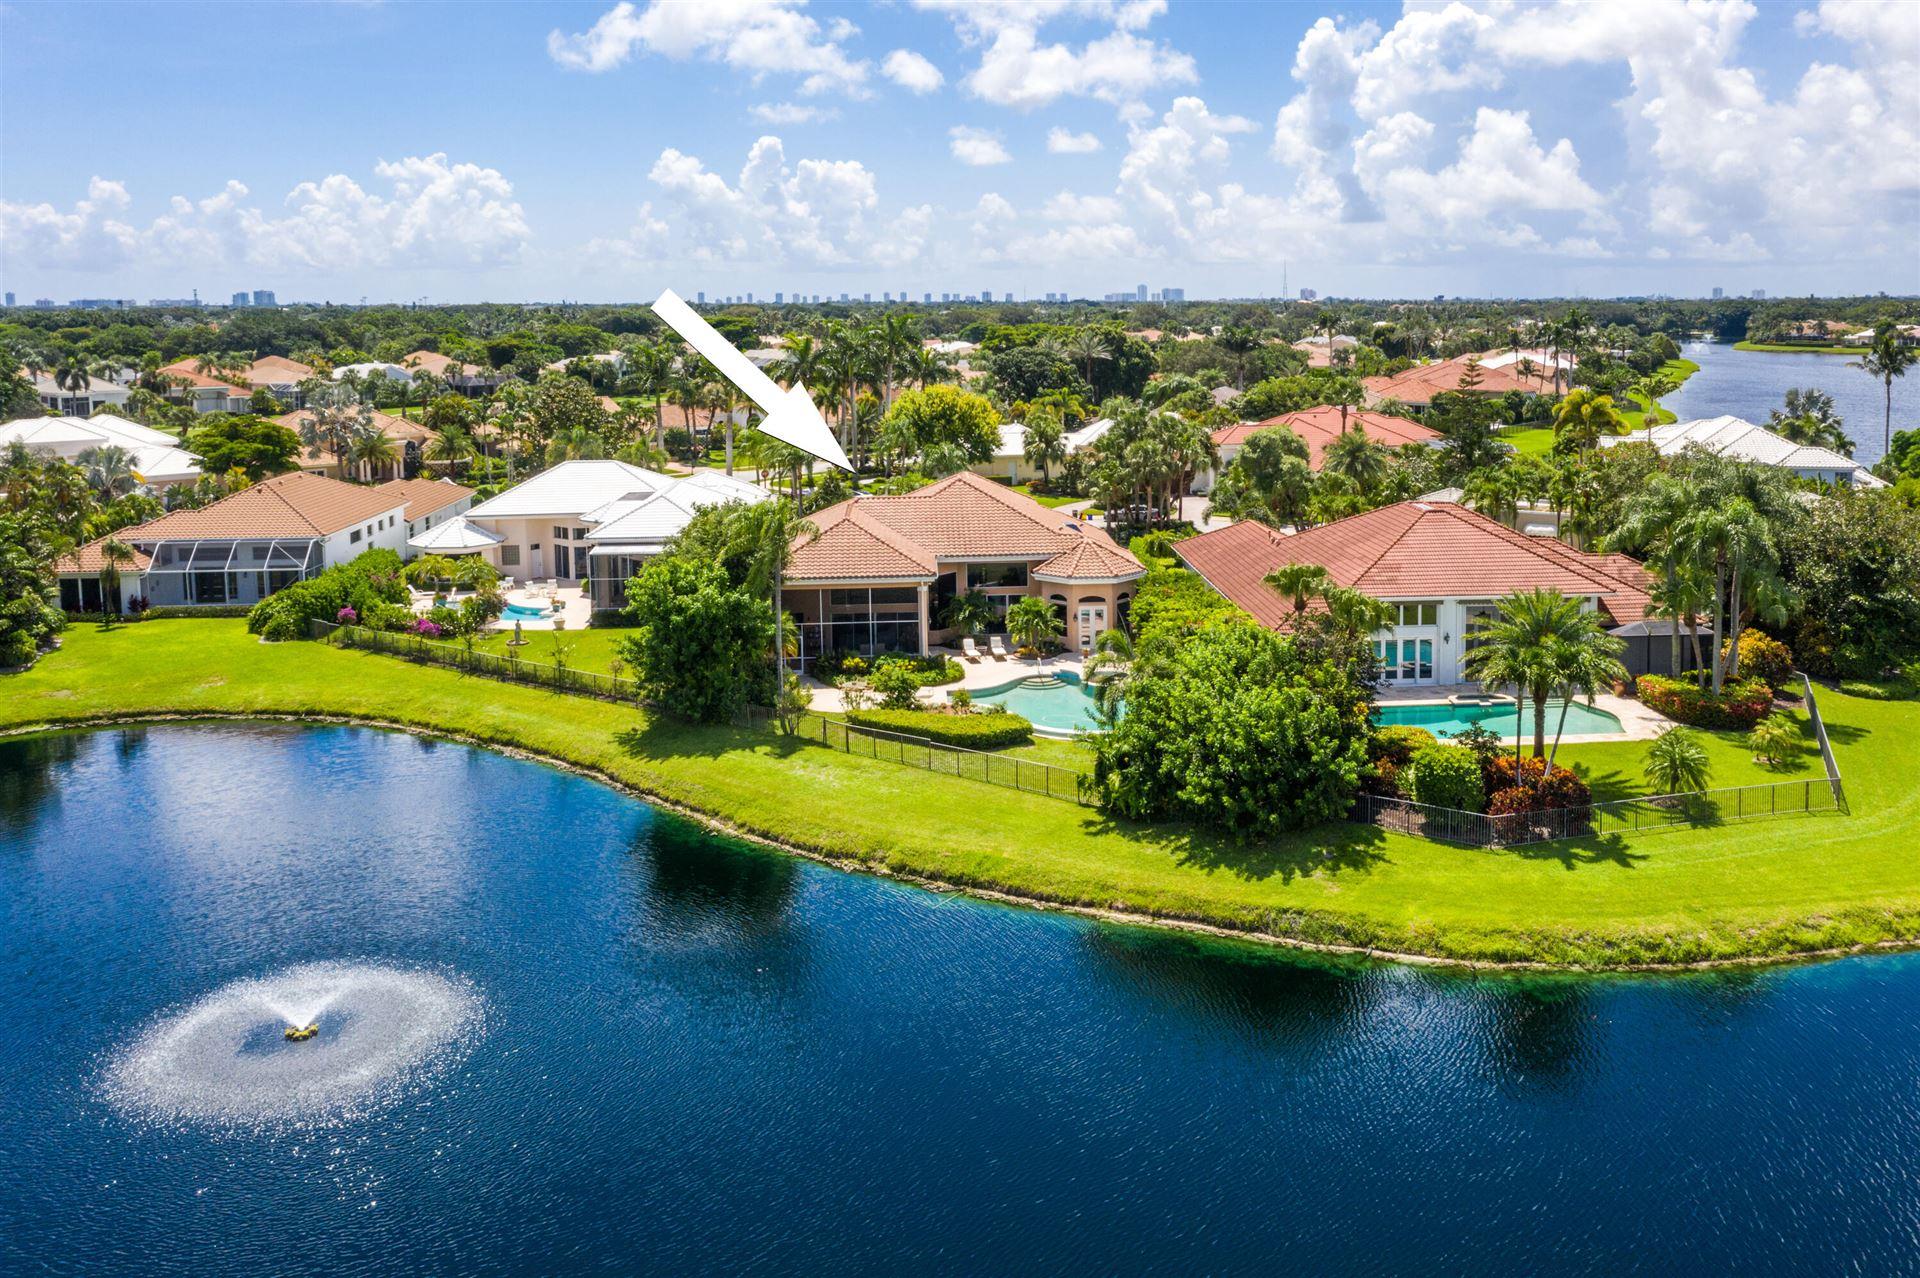 Photo of 82 Saint James Court, Palm Beach Gardens, FL 33418 (MLS # RX-10733872)